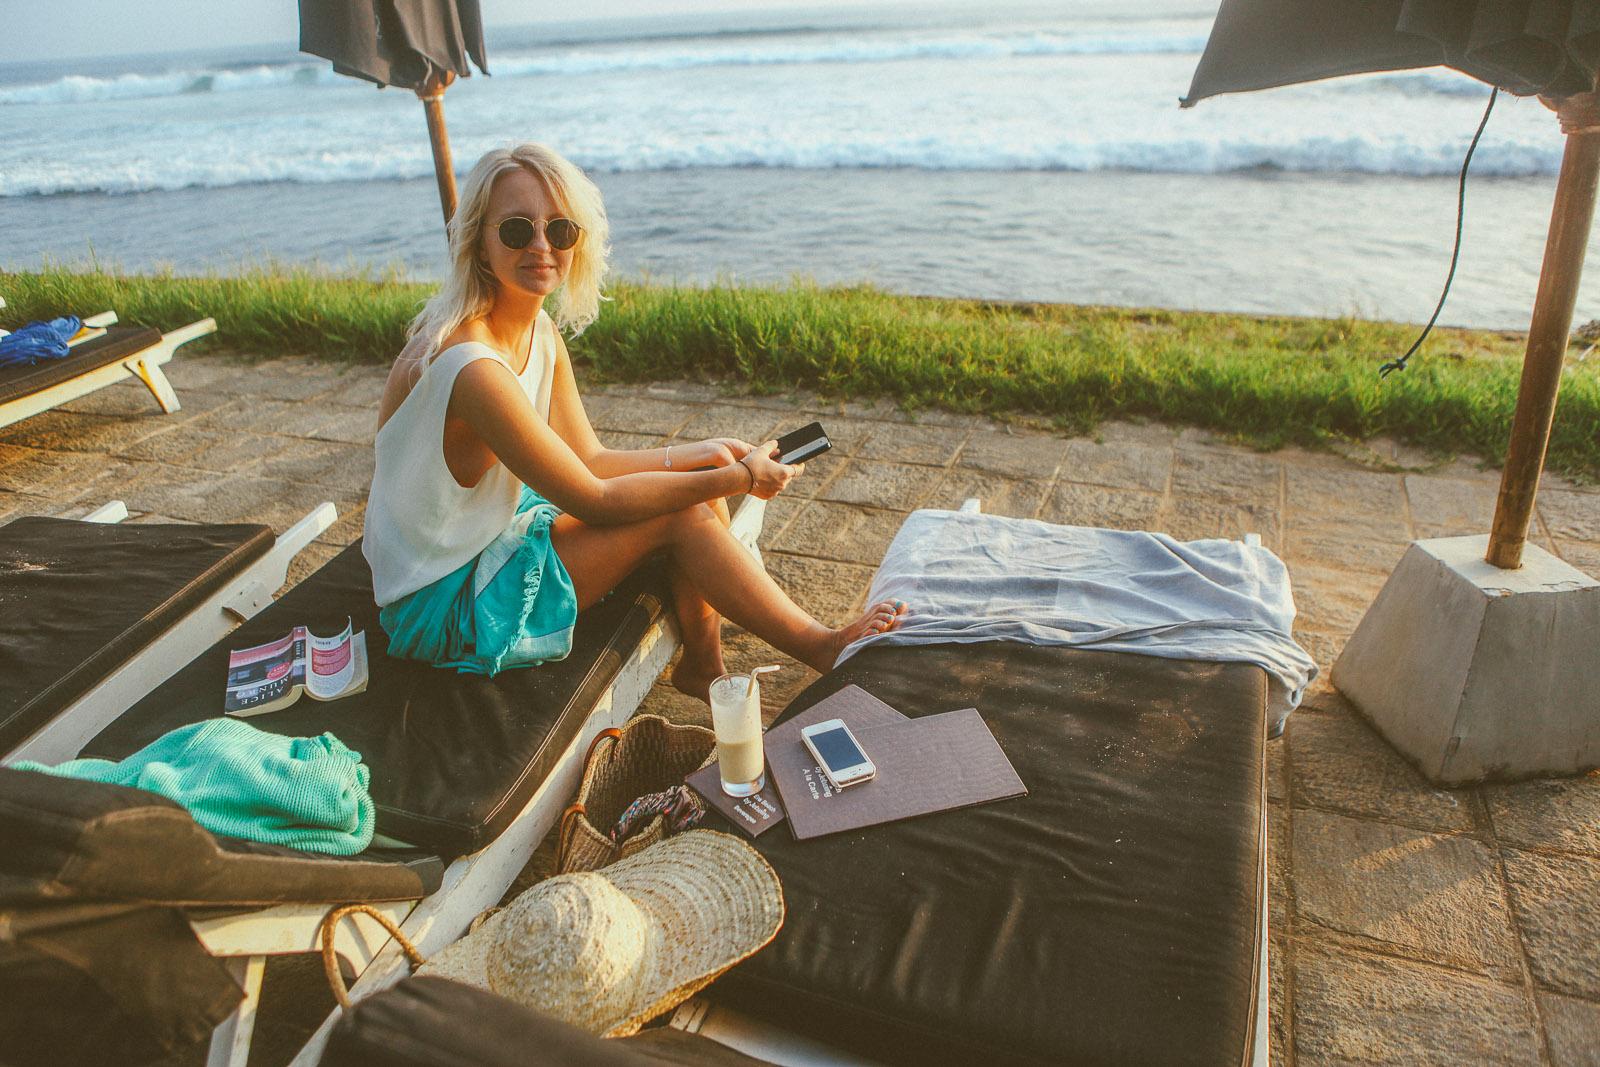 Sri Lanka-Hikkaduwa-Midigama-thalpe-era-beach-jetwing-surf-travel-blog-IMG_8660